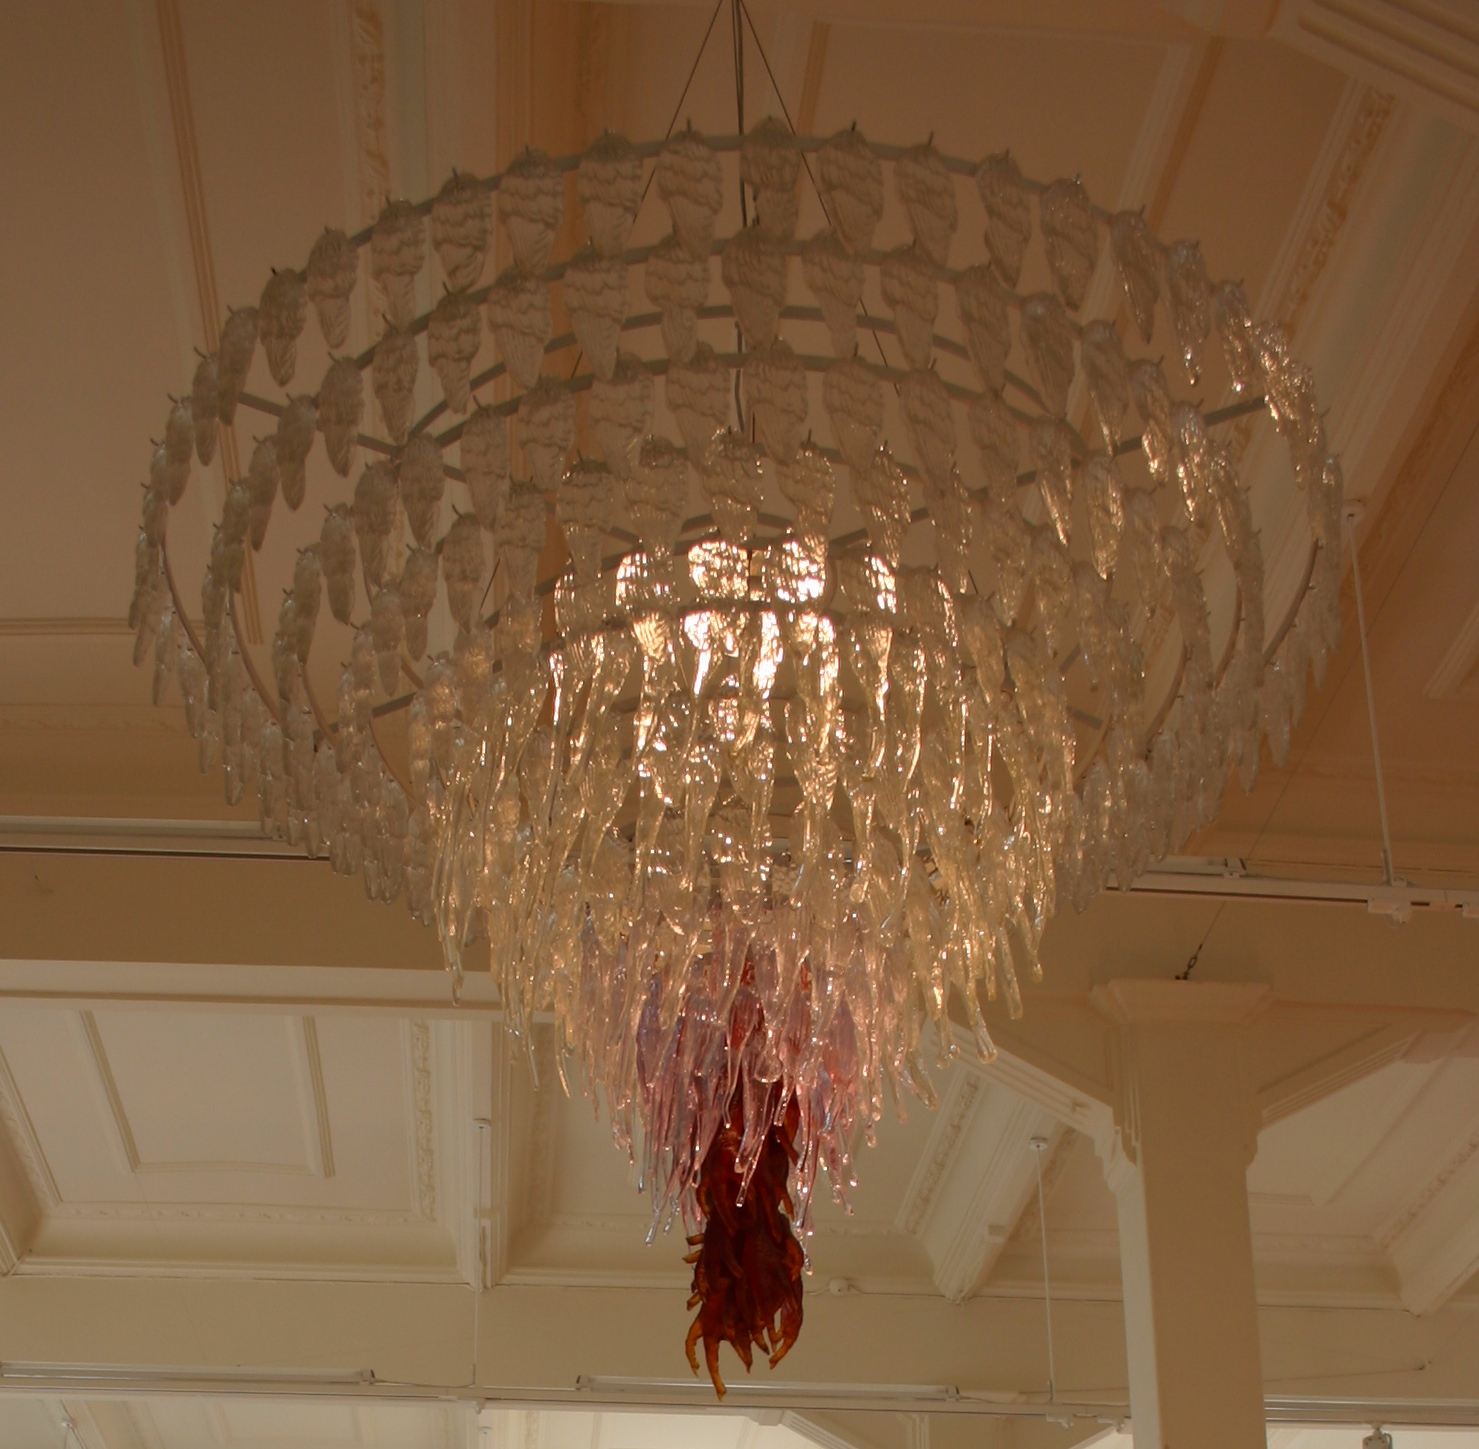 Craft Aotearoa Charitable Trust: Innovative Glass Exhibition